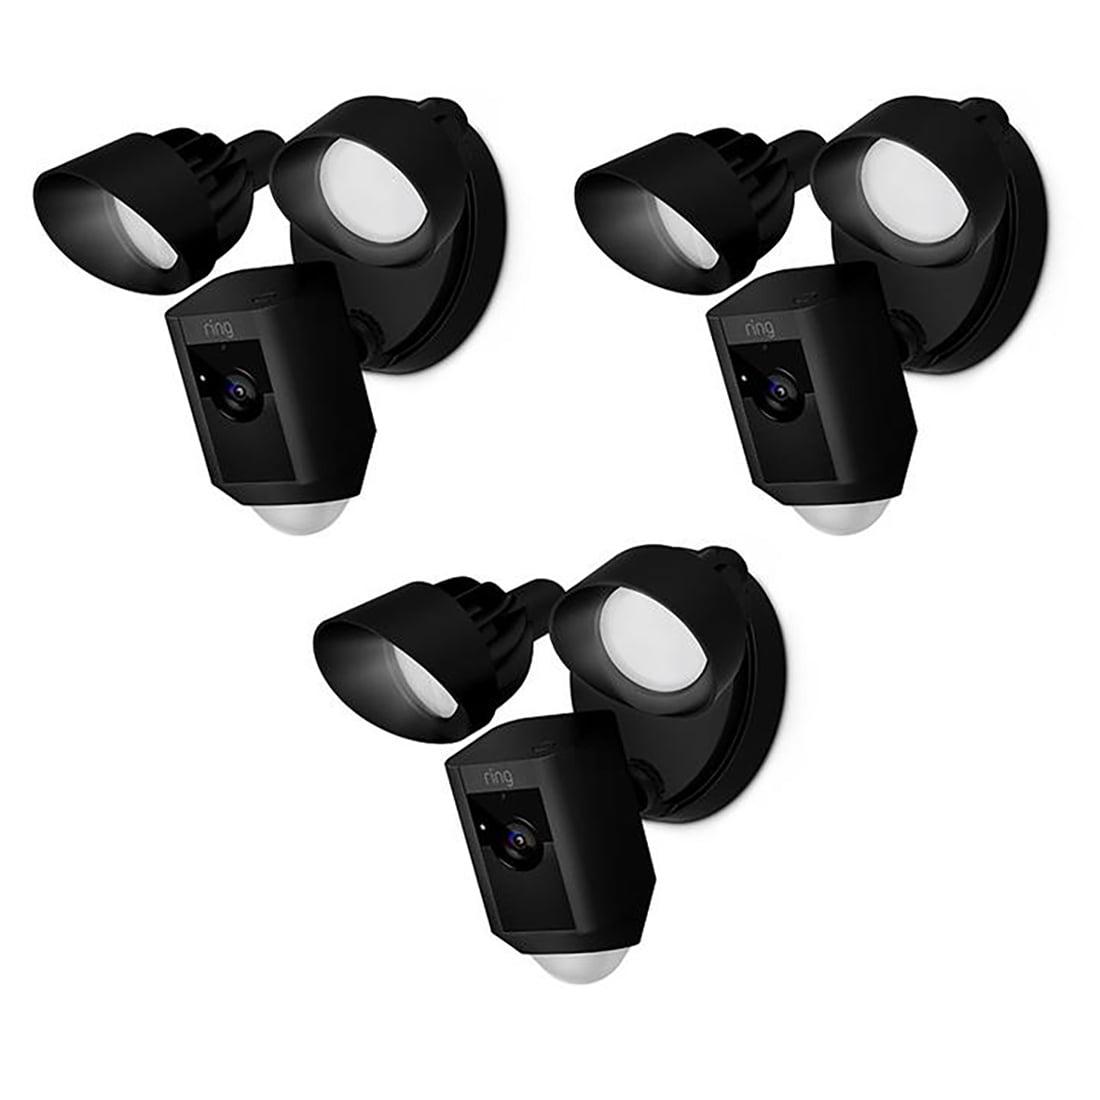 Ring Floodlight Cam X3 Black Bundle